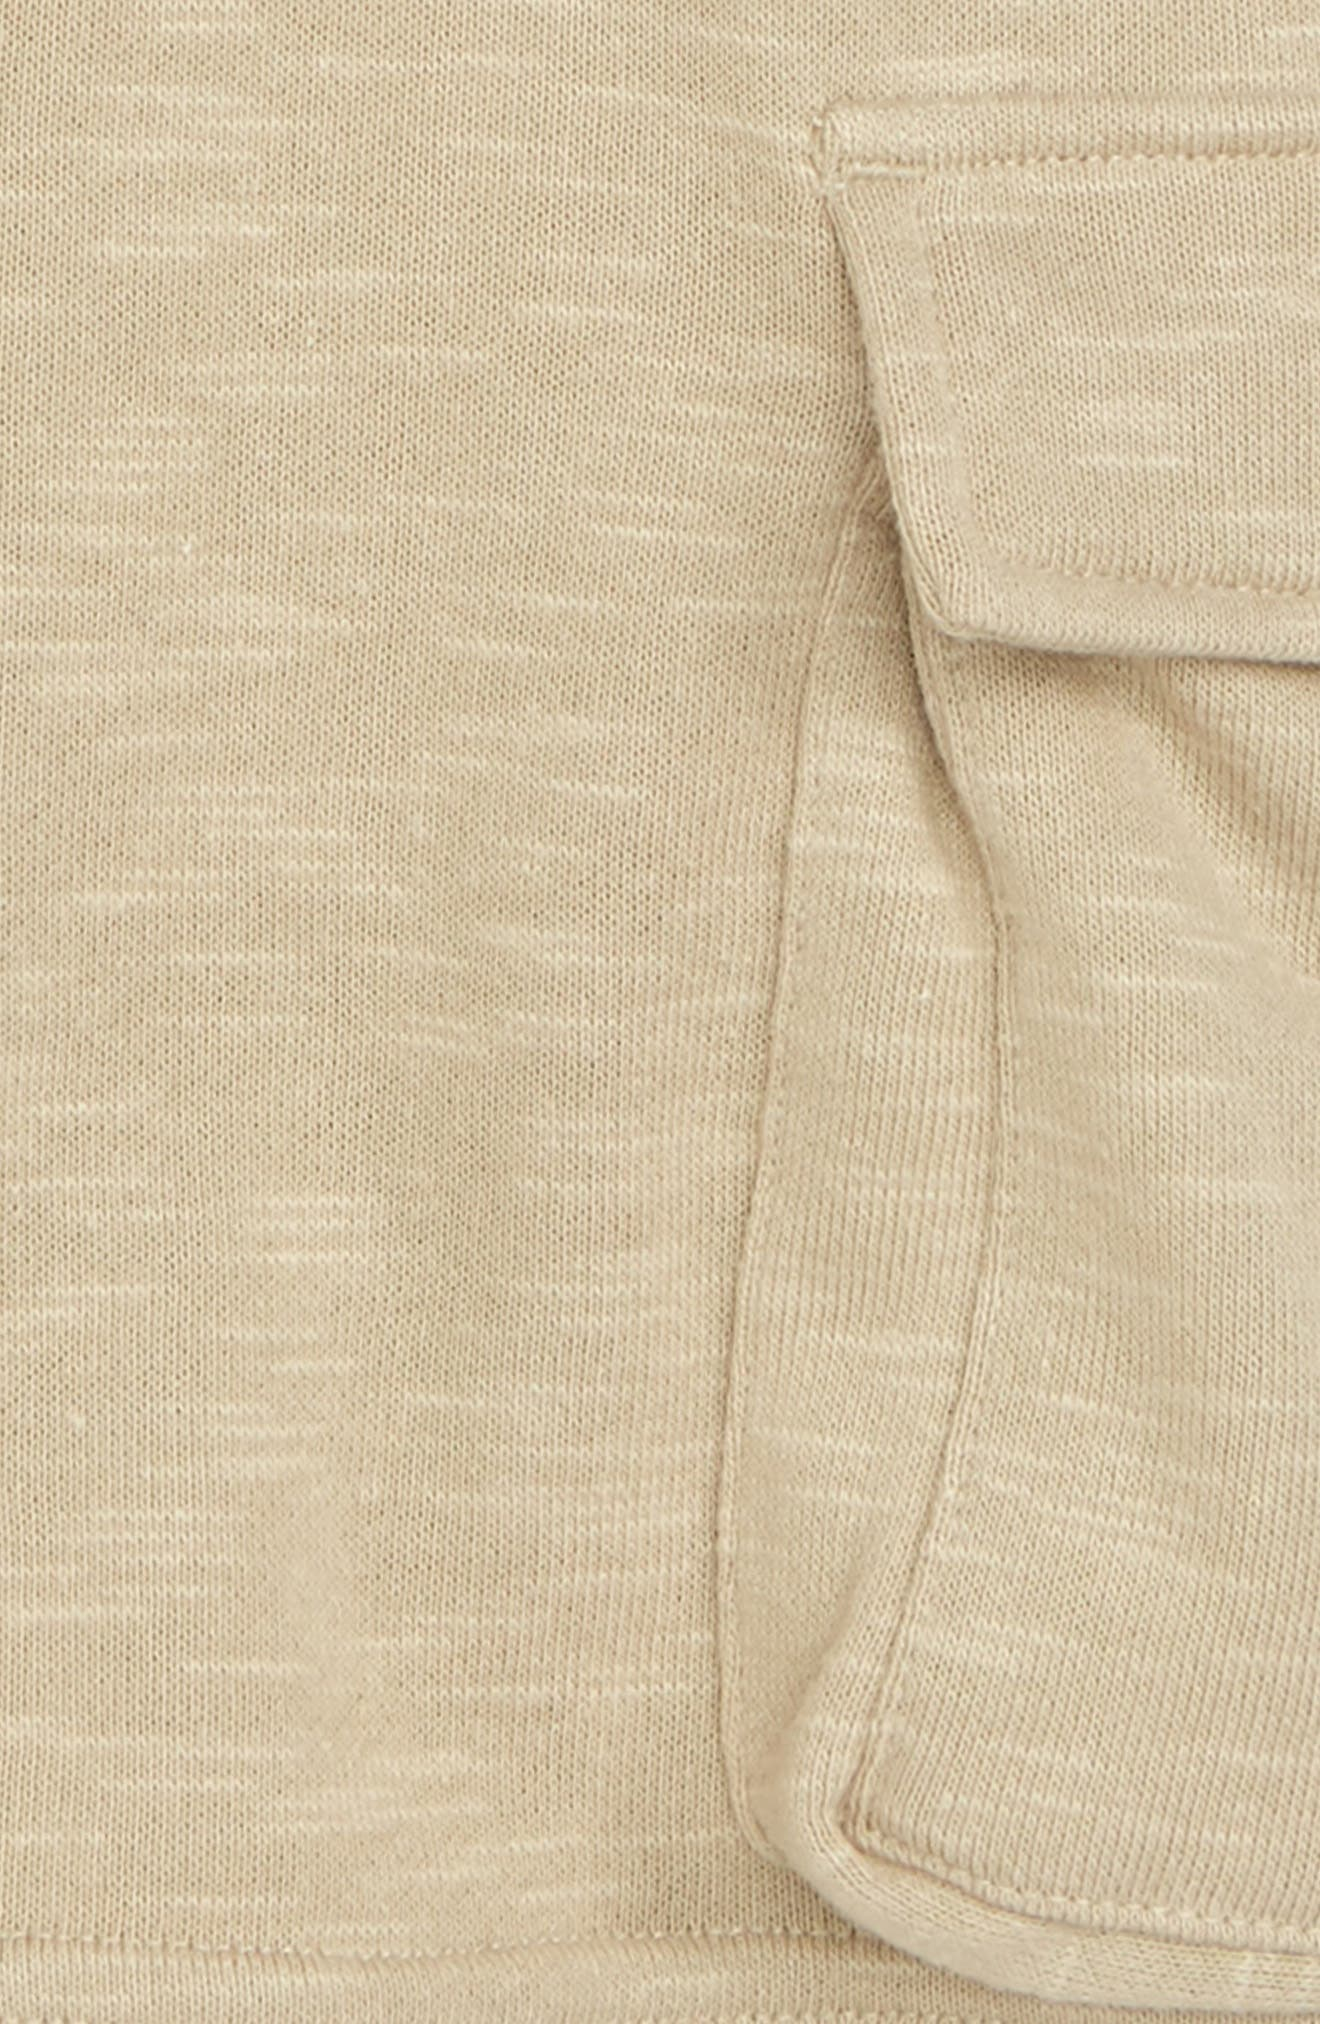 Elwood Cargo Shorts,                             Alternate thumbnail 2, color,                             250